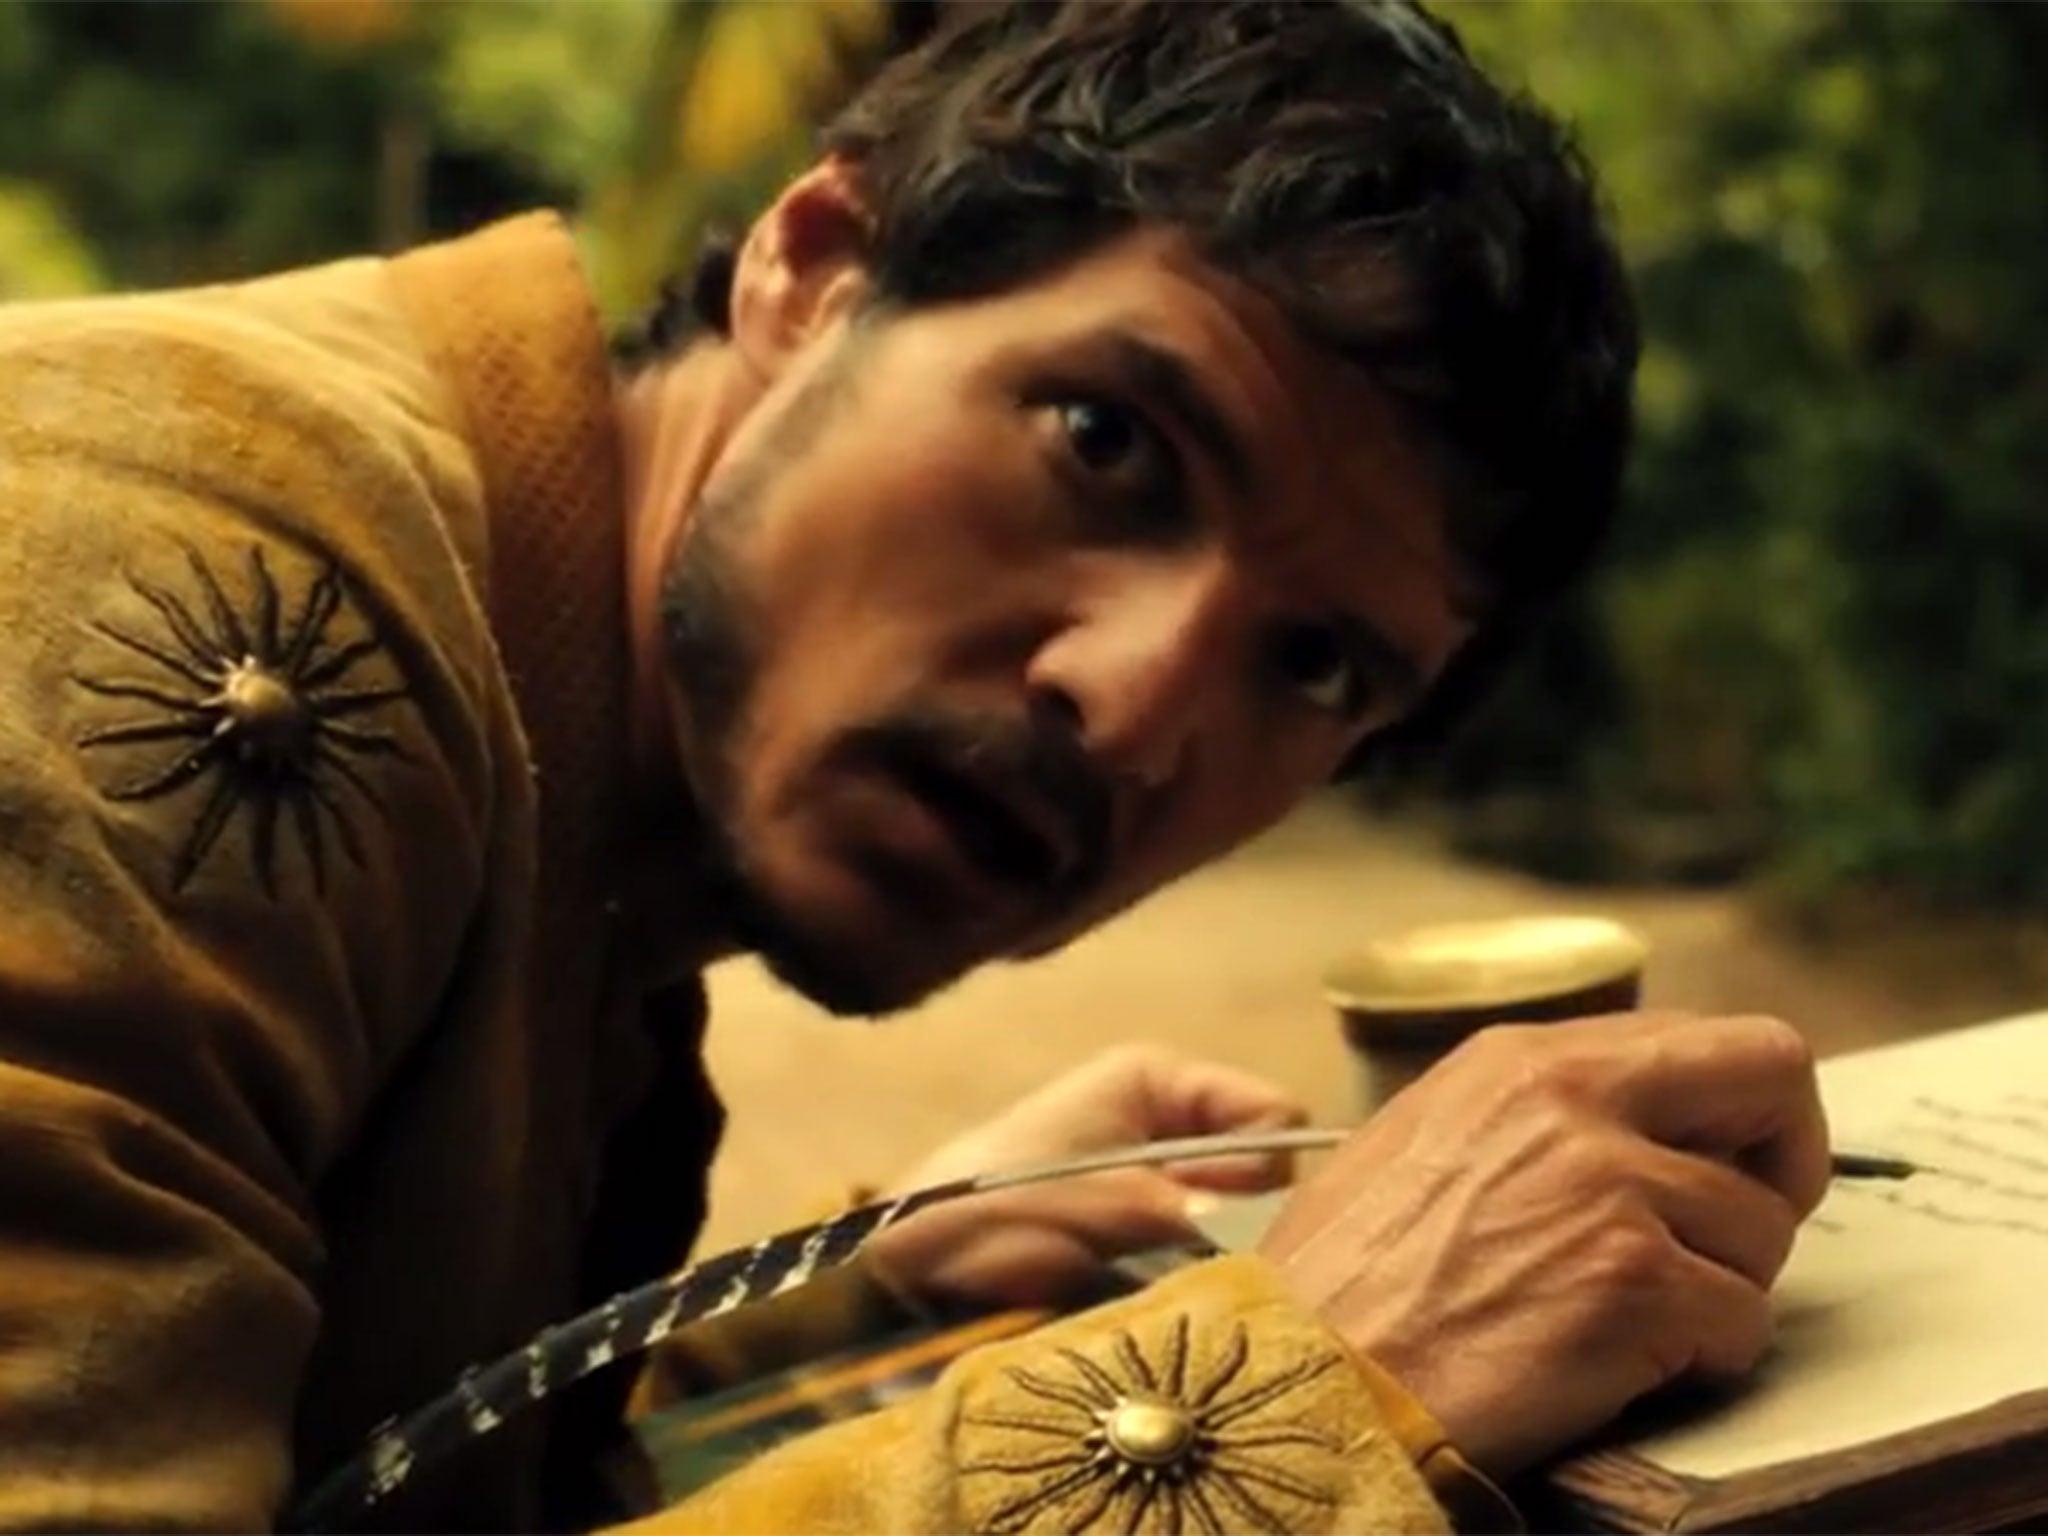 Game of thrones season 4 blooper reel unveiled at comic for Https pedro camera it login